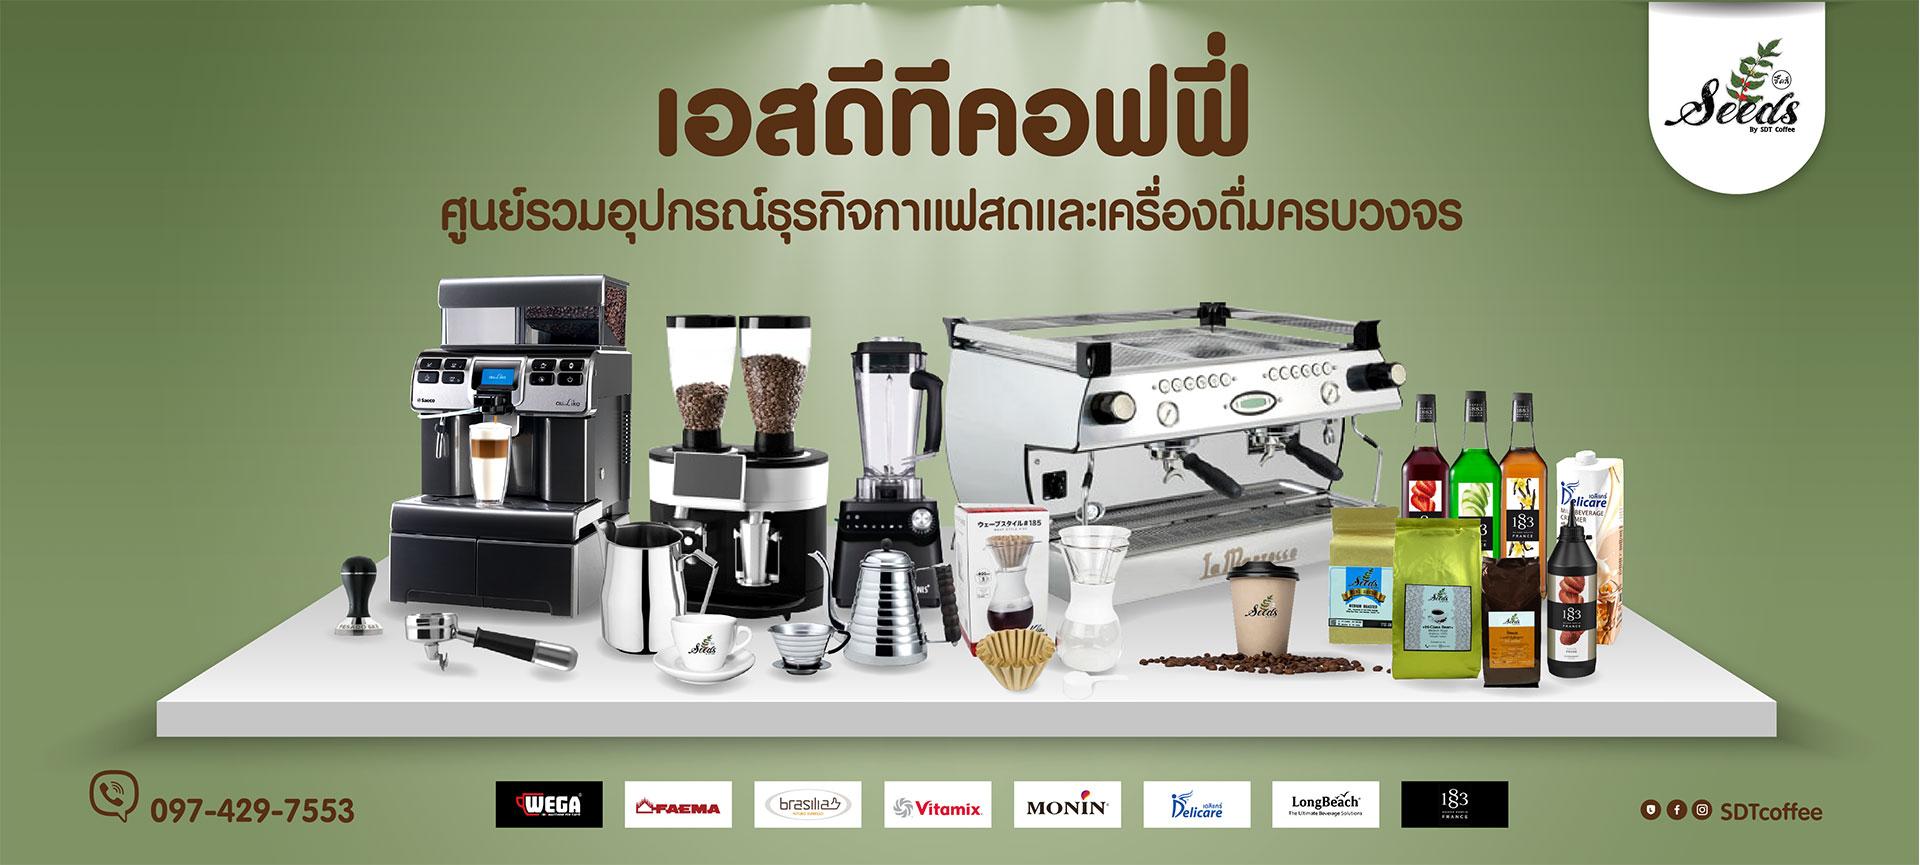 facebook-cover-sdt-coffee